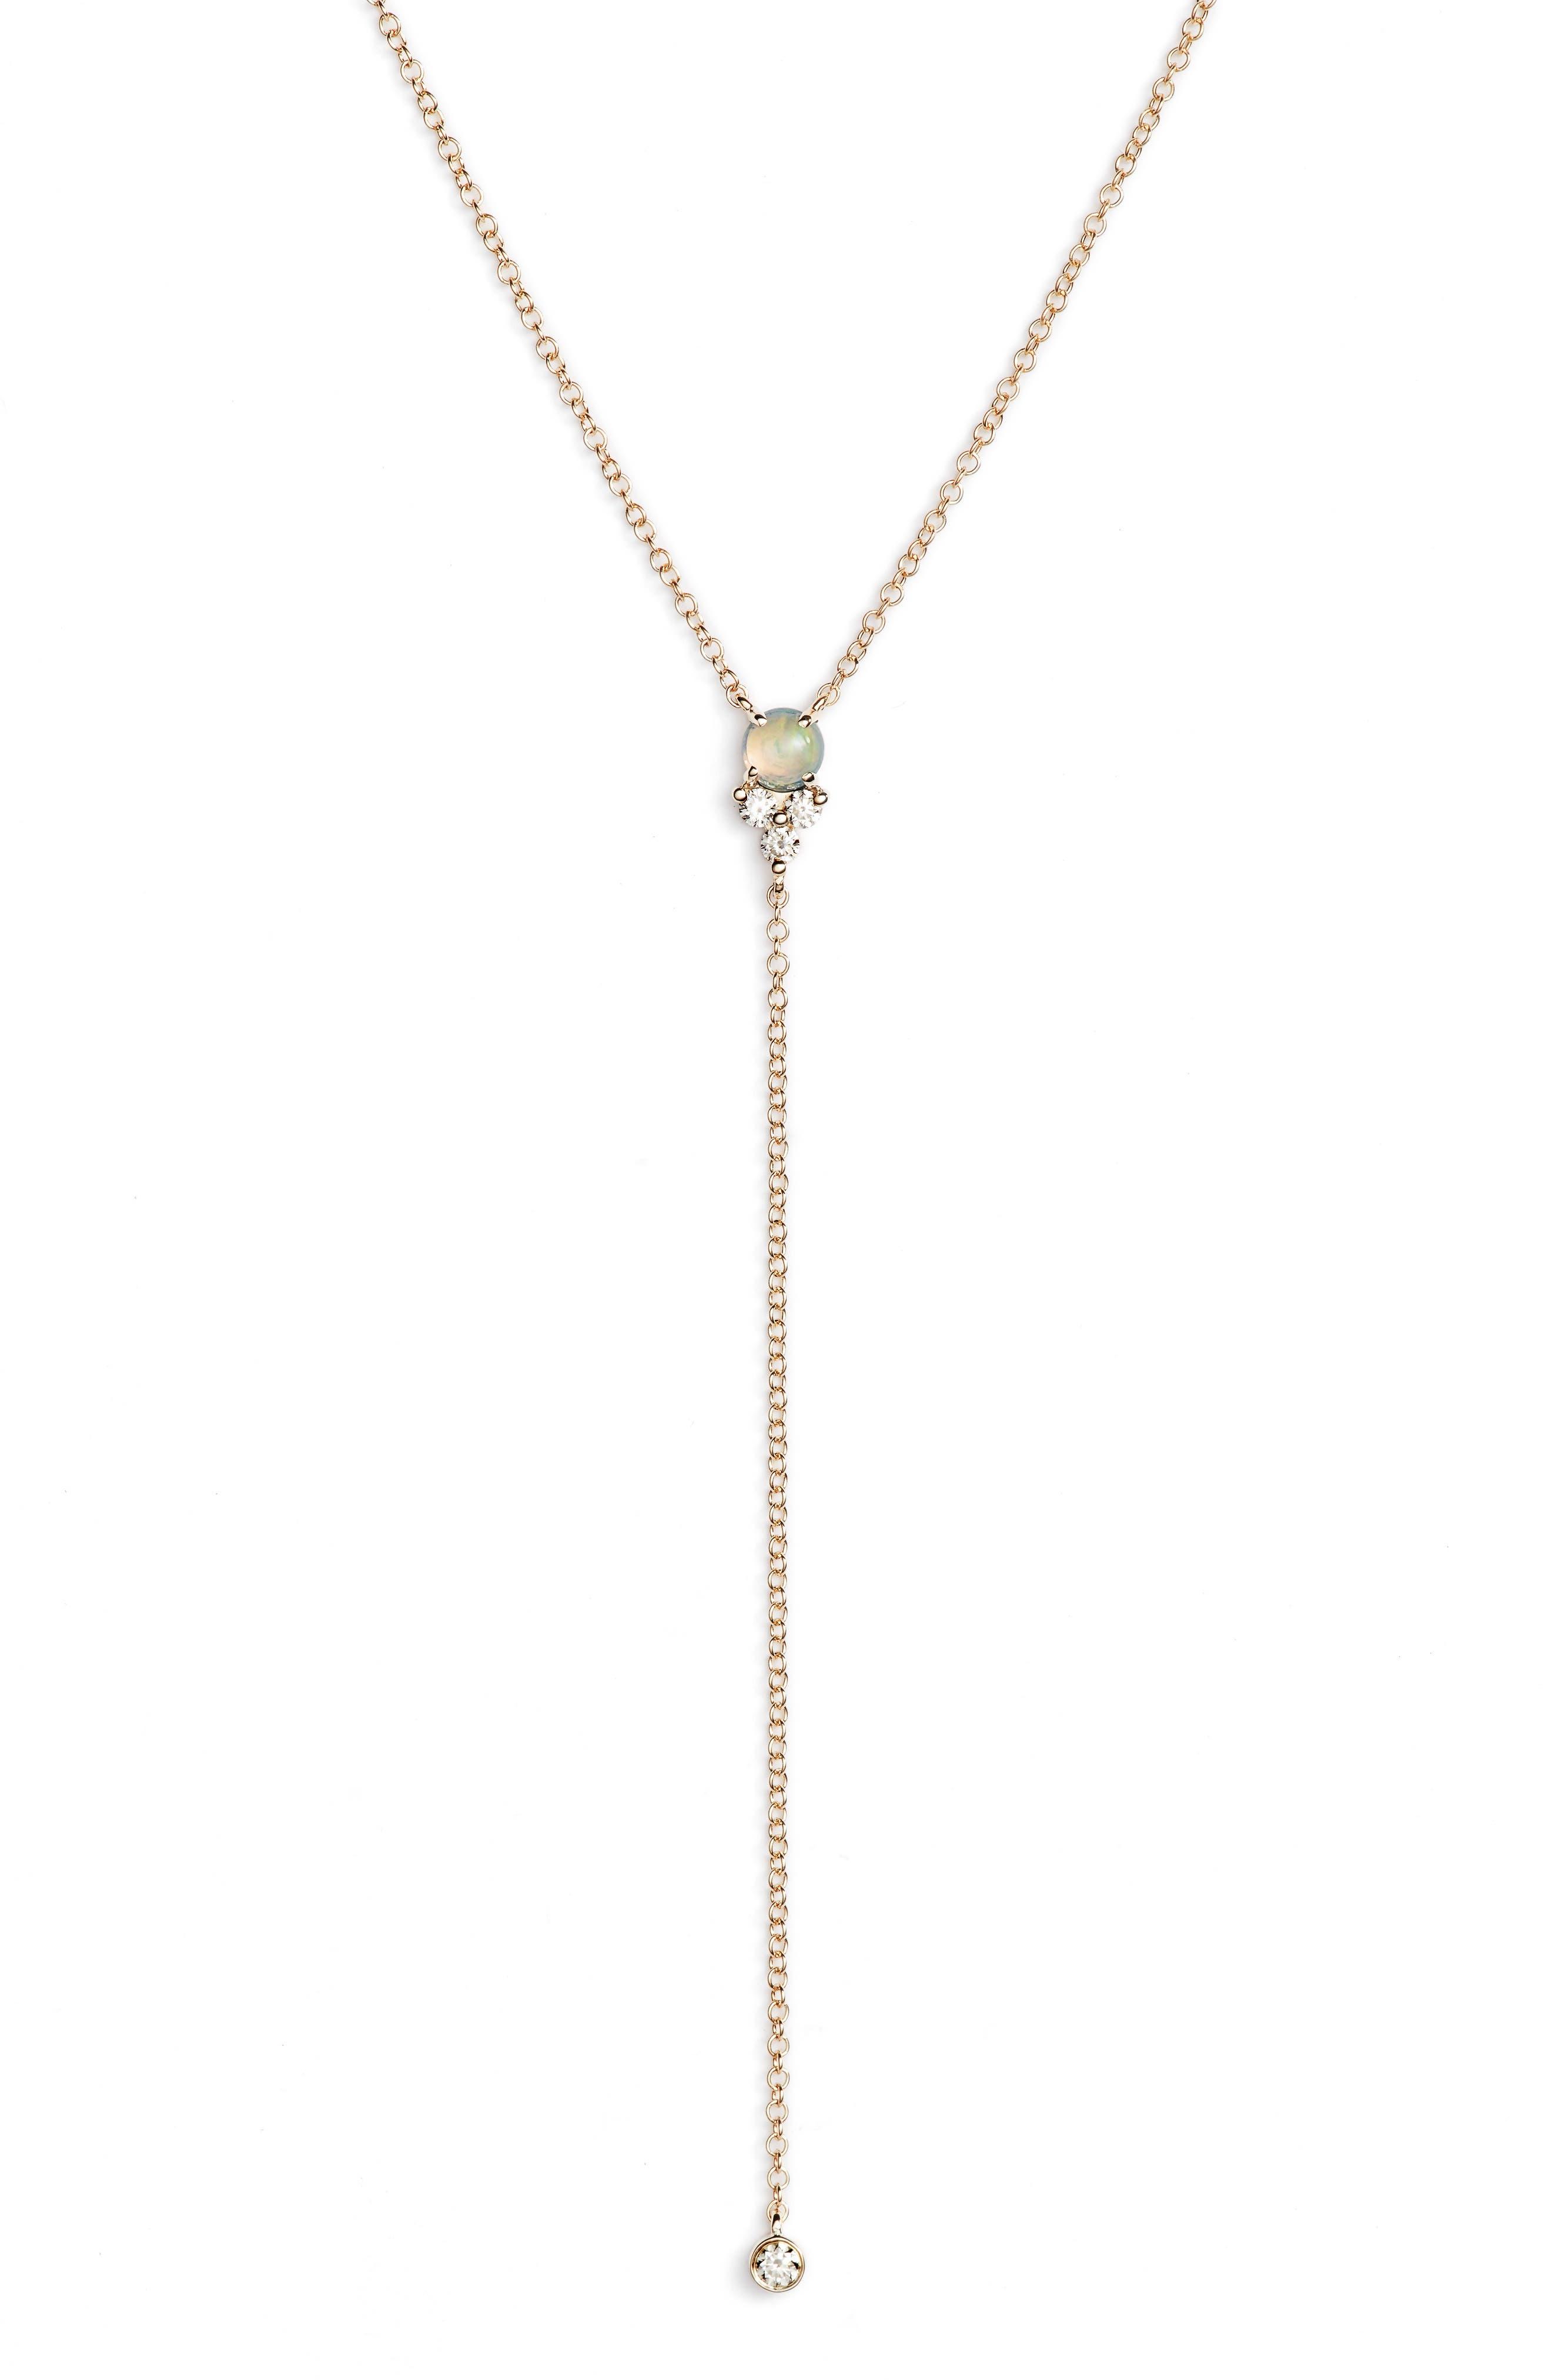 Diamond Trio Stone Lariat Necklace,                             Main thumbnail 1, color,                             YELLOW GOLD/ OPAL